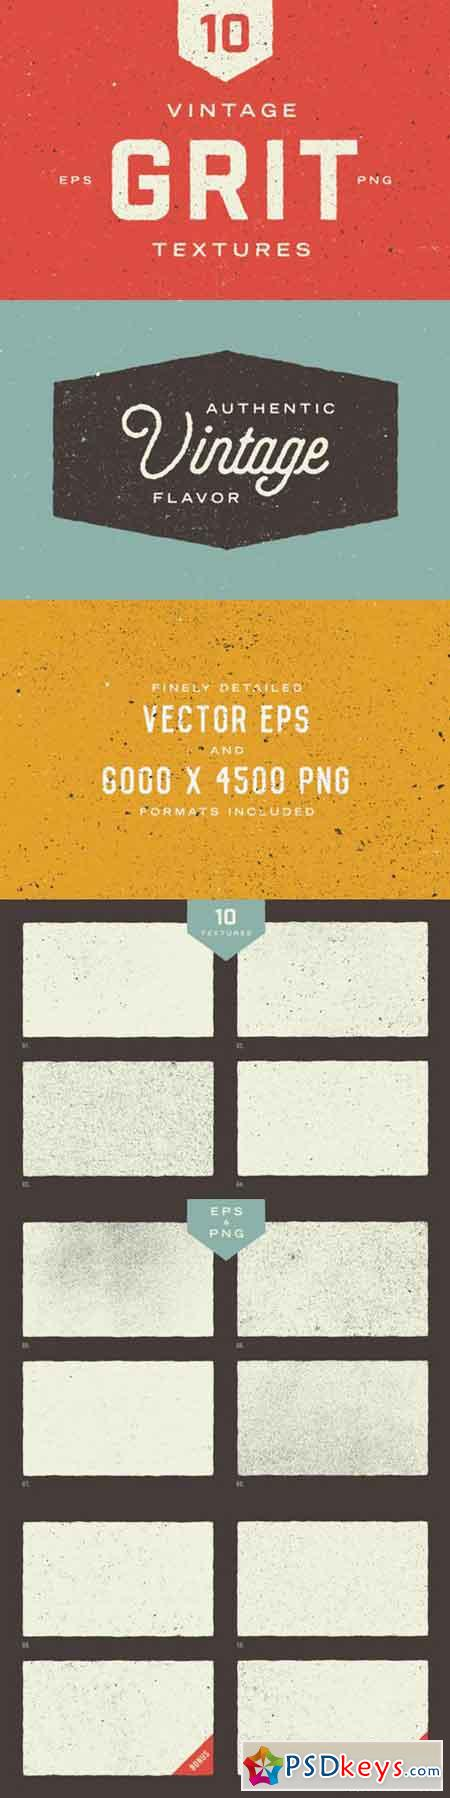 Vintage Grit Textures 324177 » Free Download Photoshop